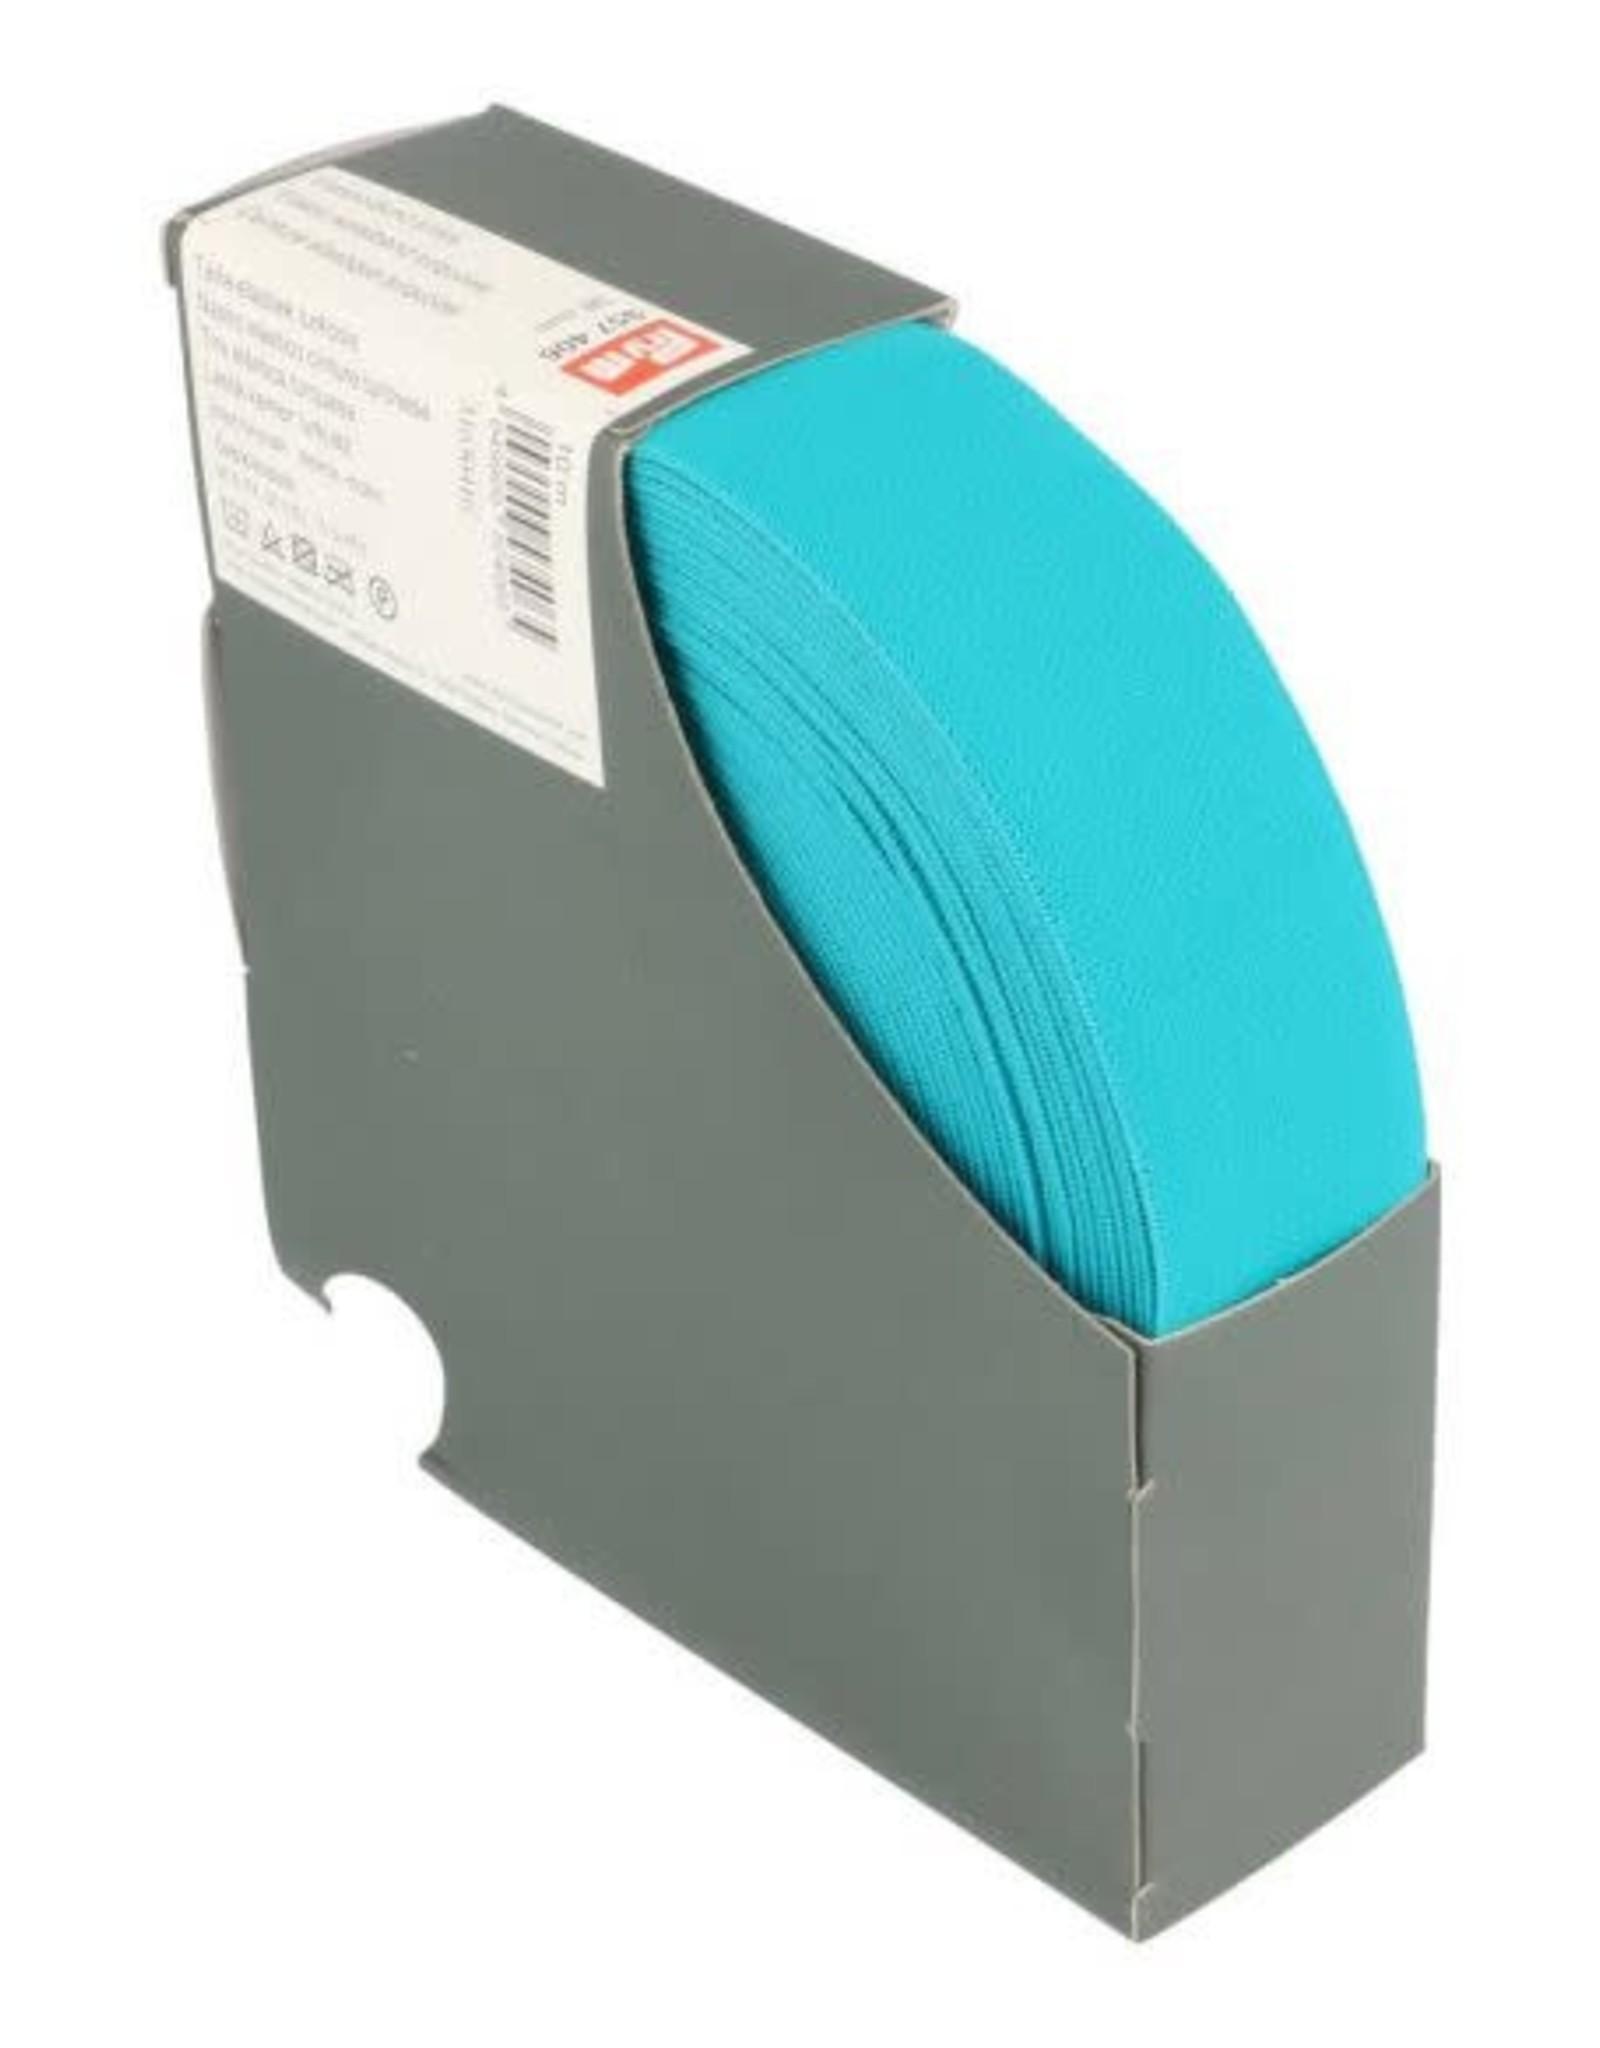 Prym Prym TAILLE ELASTIEK Turquoise 38mm